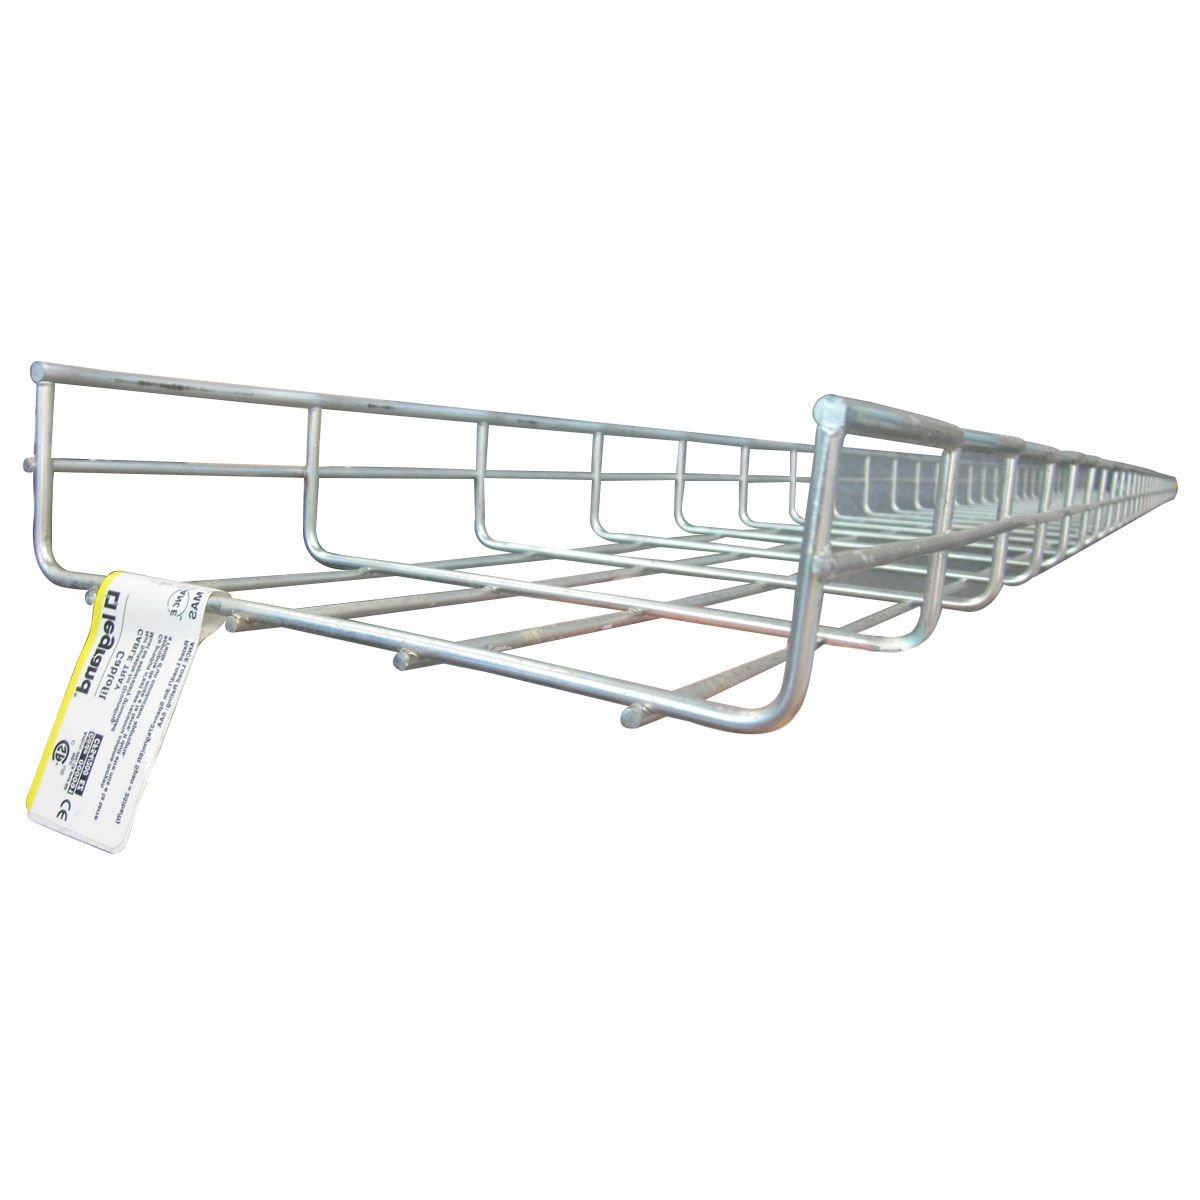 Bandeja porta cable tipo escalerilla galvanizada 0.10 m x